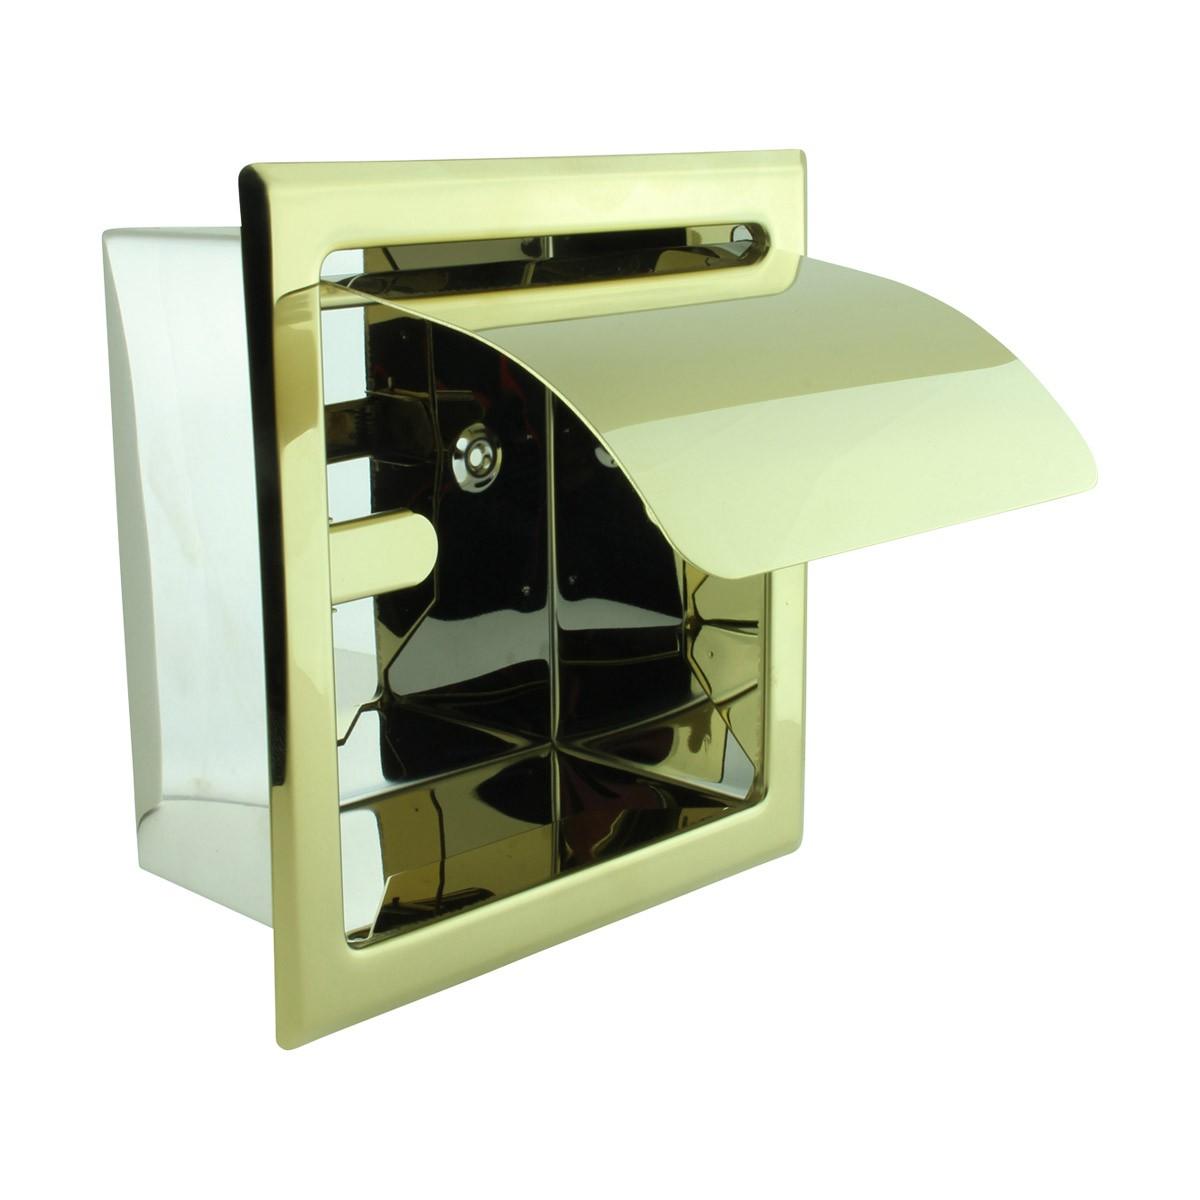 Recessed Toilet Paper Tissue Holder Gold Stainless Steel Pack of 2 toilet paper holder brass toilet tissue